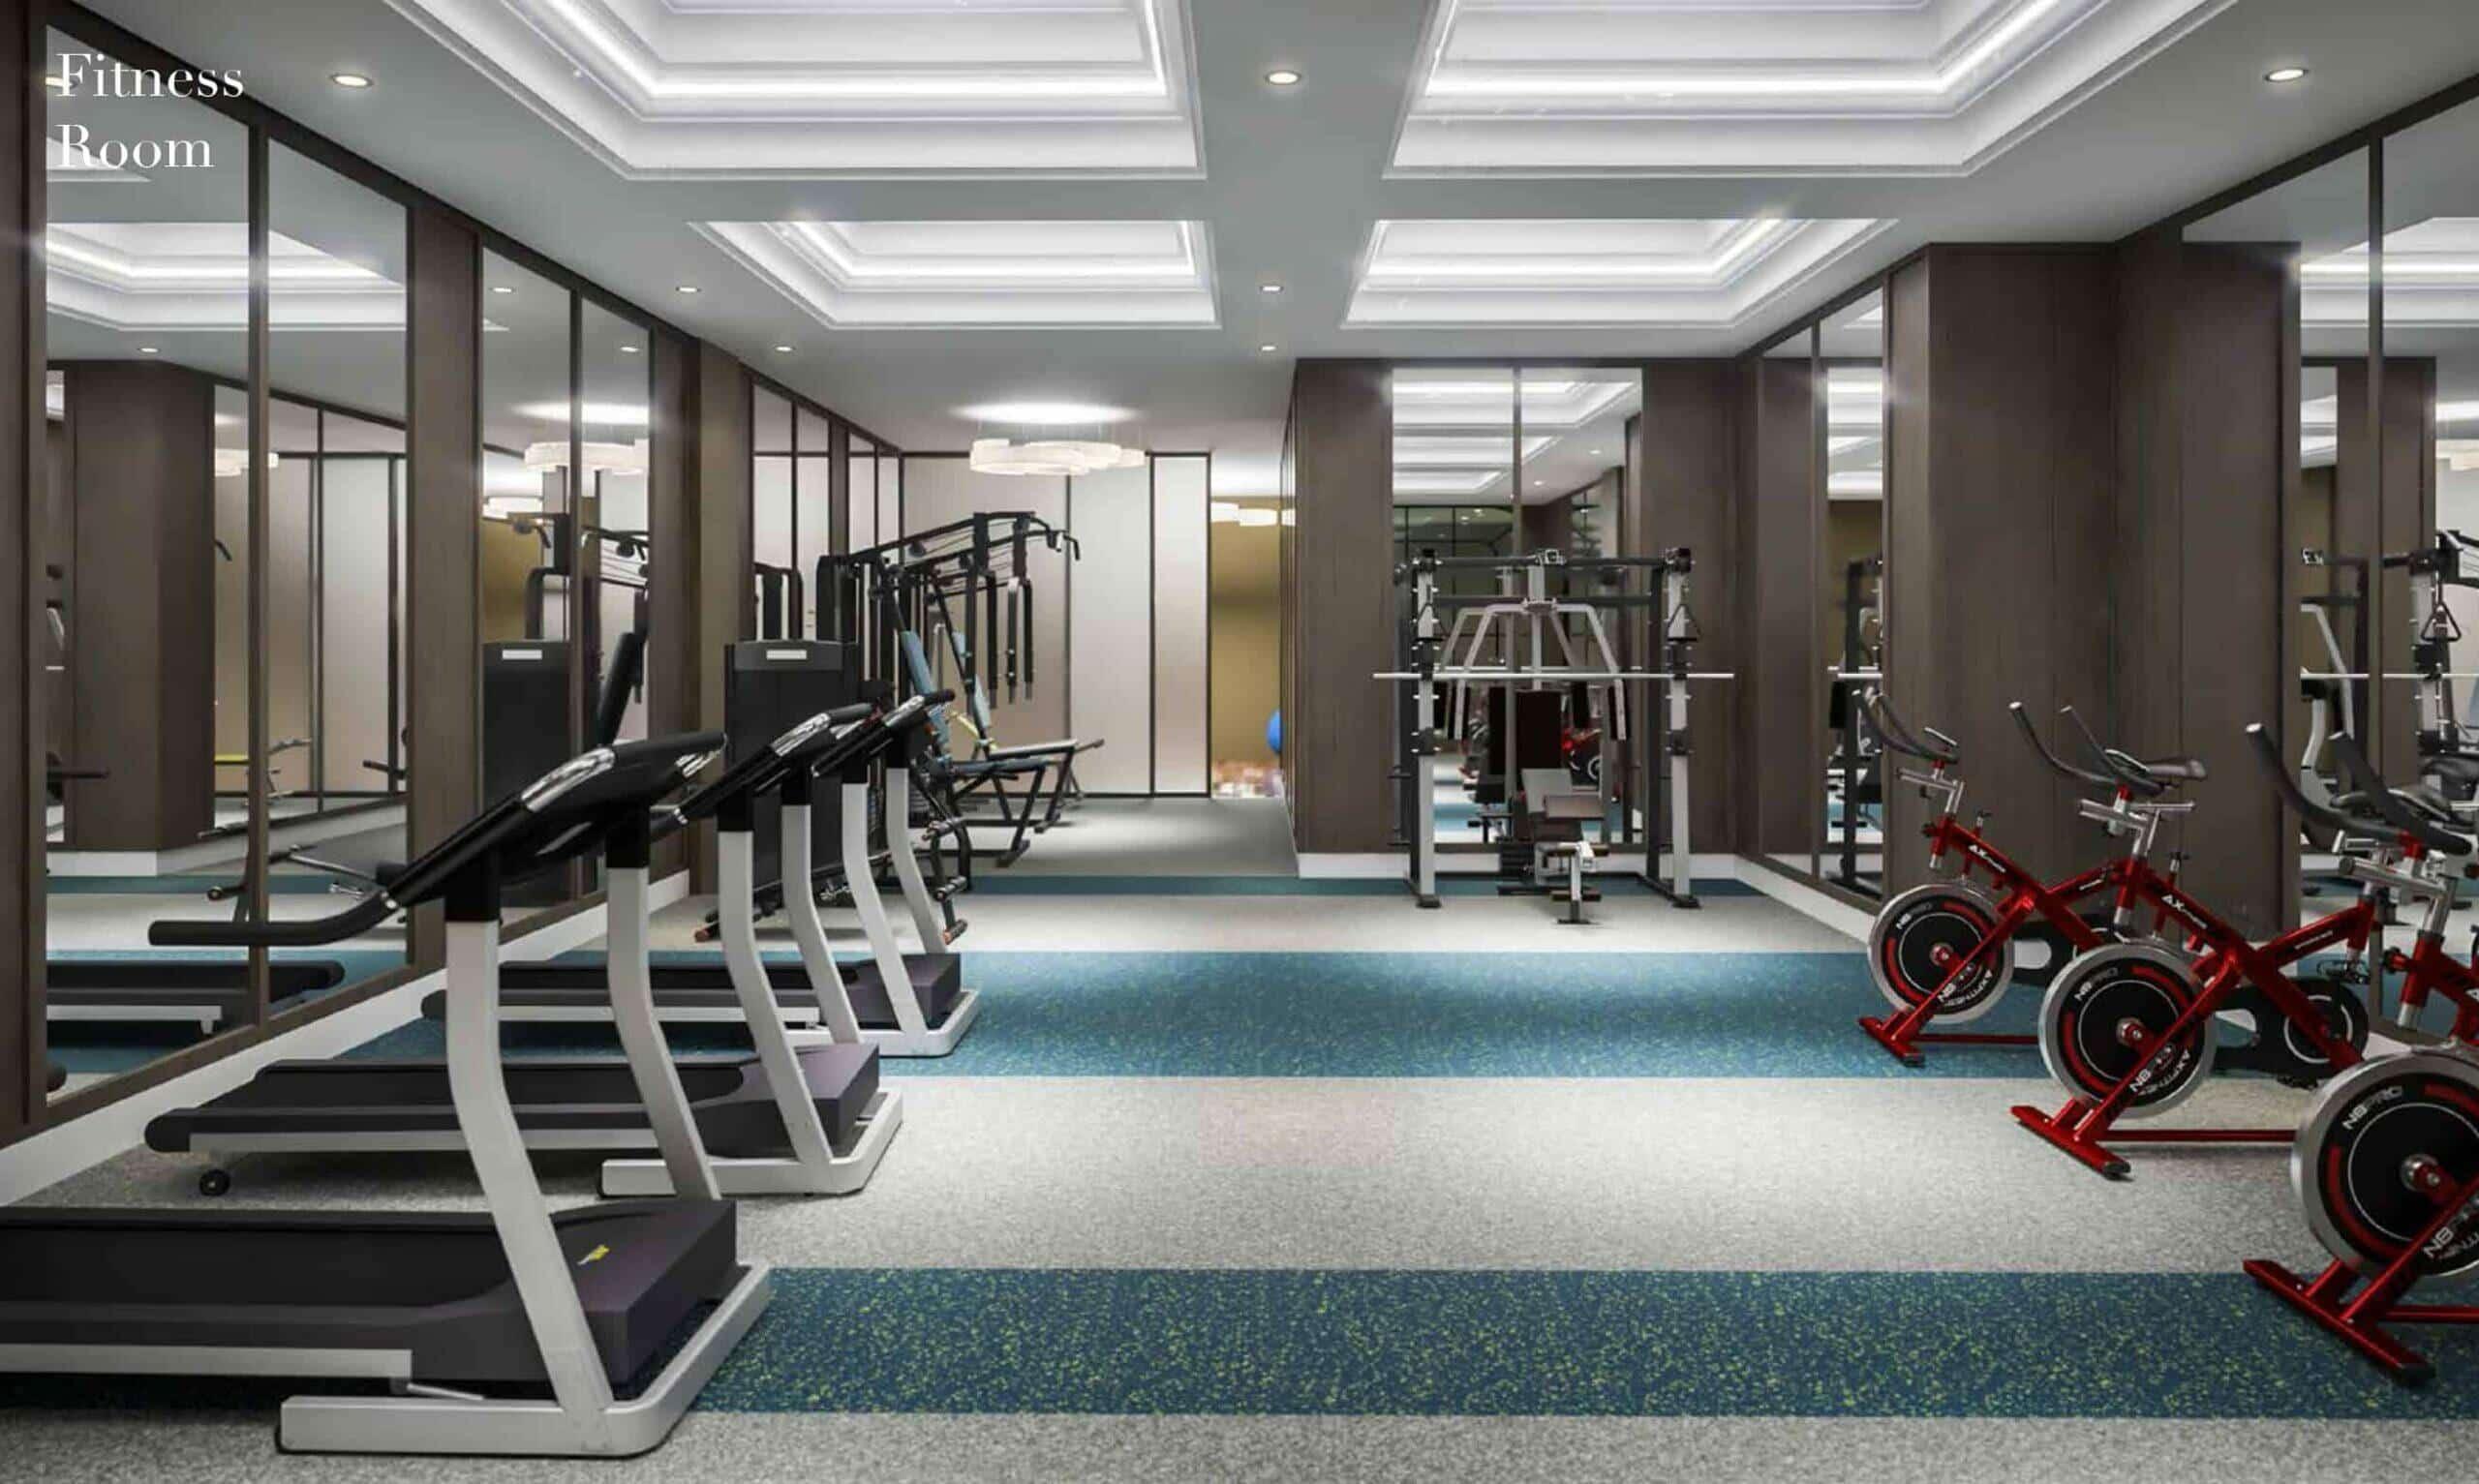 Bijou Brochure Fitness Room scaled